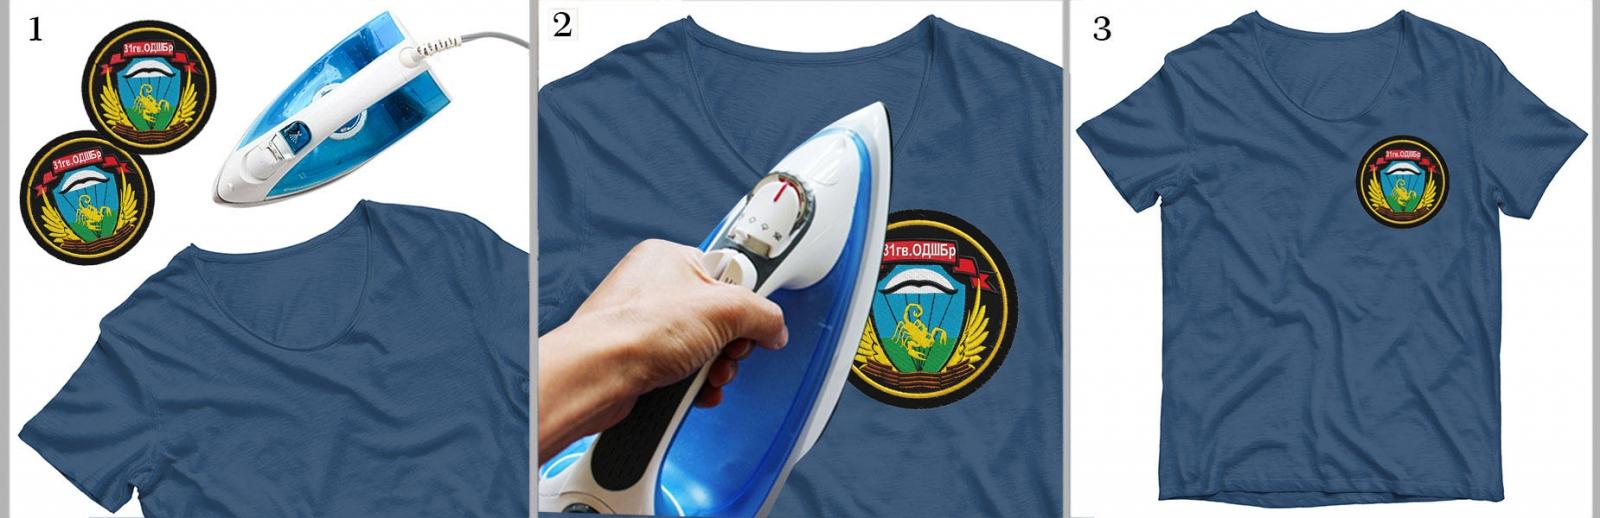 Шеврон десантника 31 гв. ОДШБр на футболке